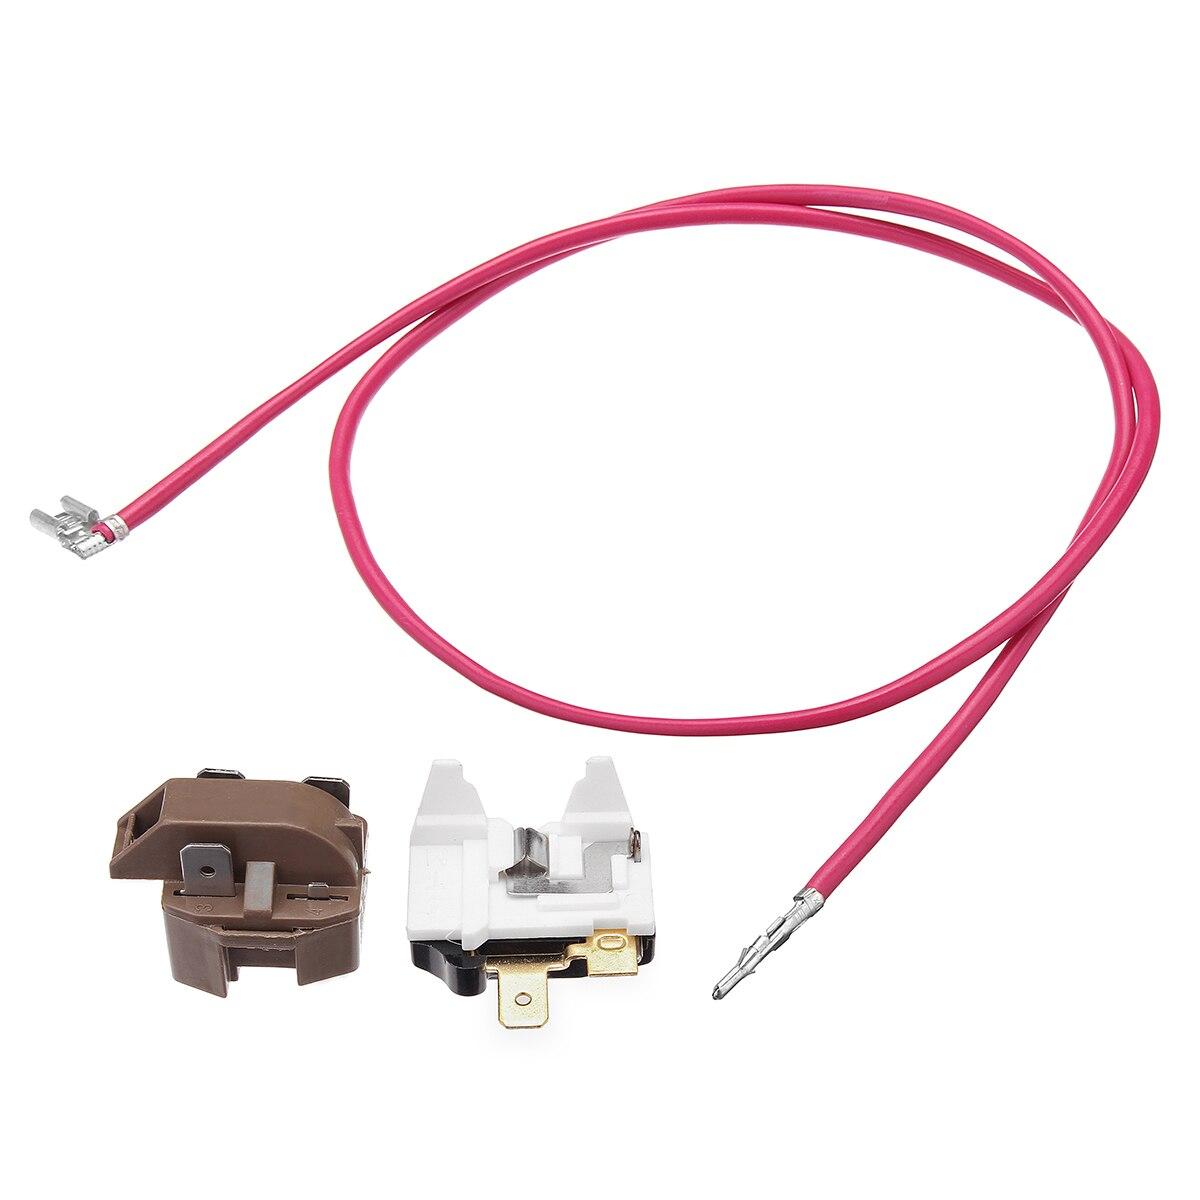 1set Refrigerator Relay Overload Kit With Tube Hosepipe